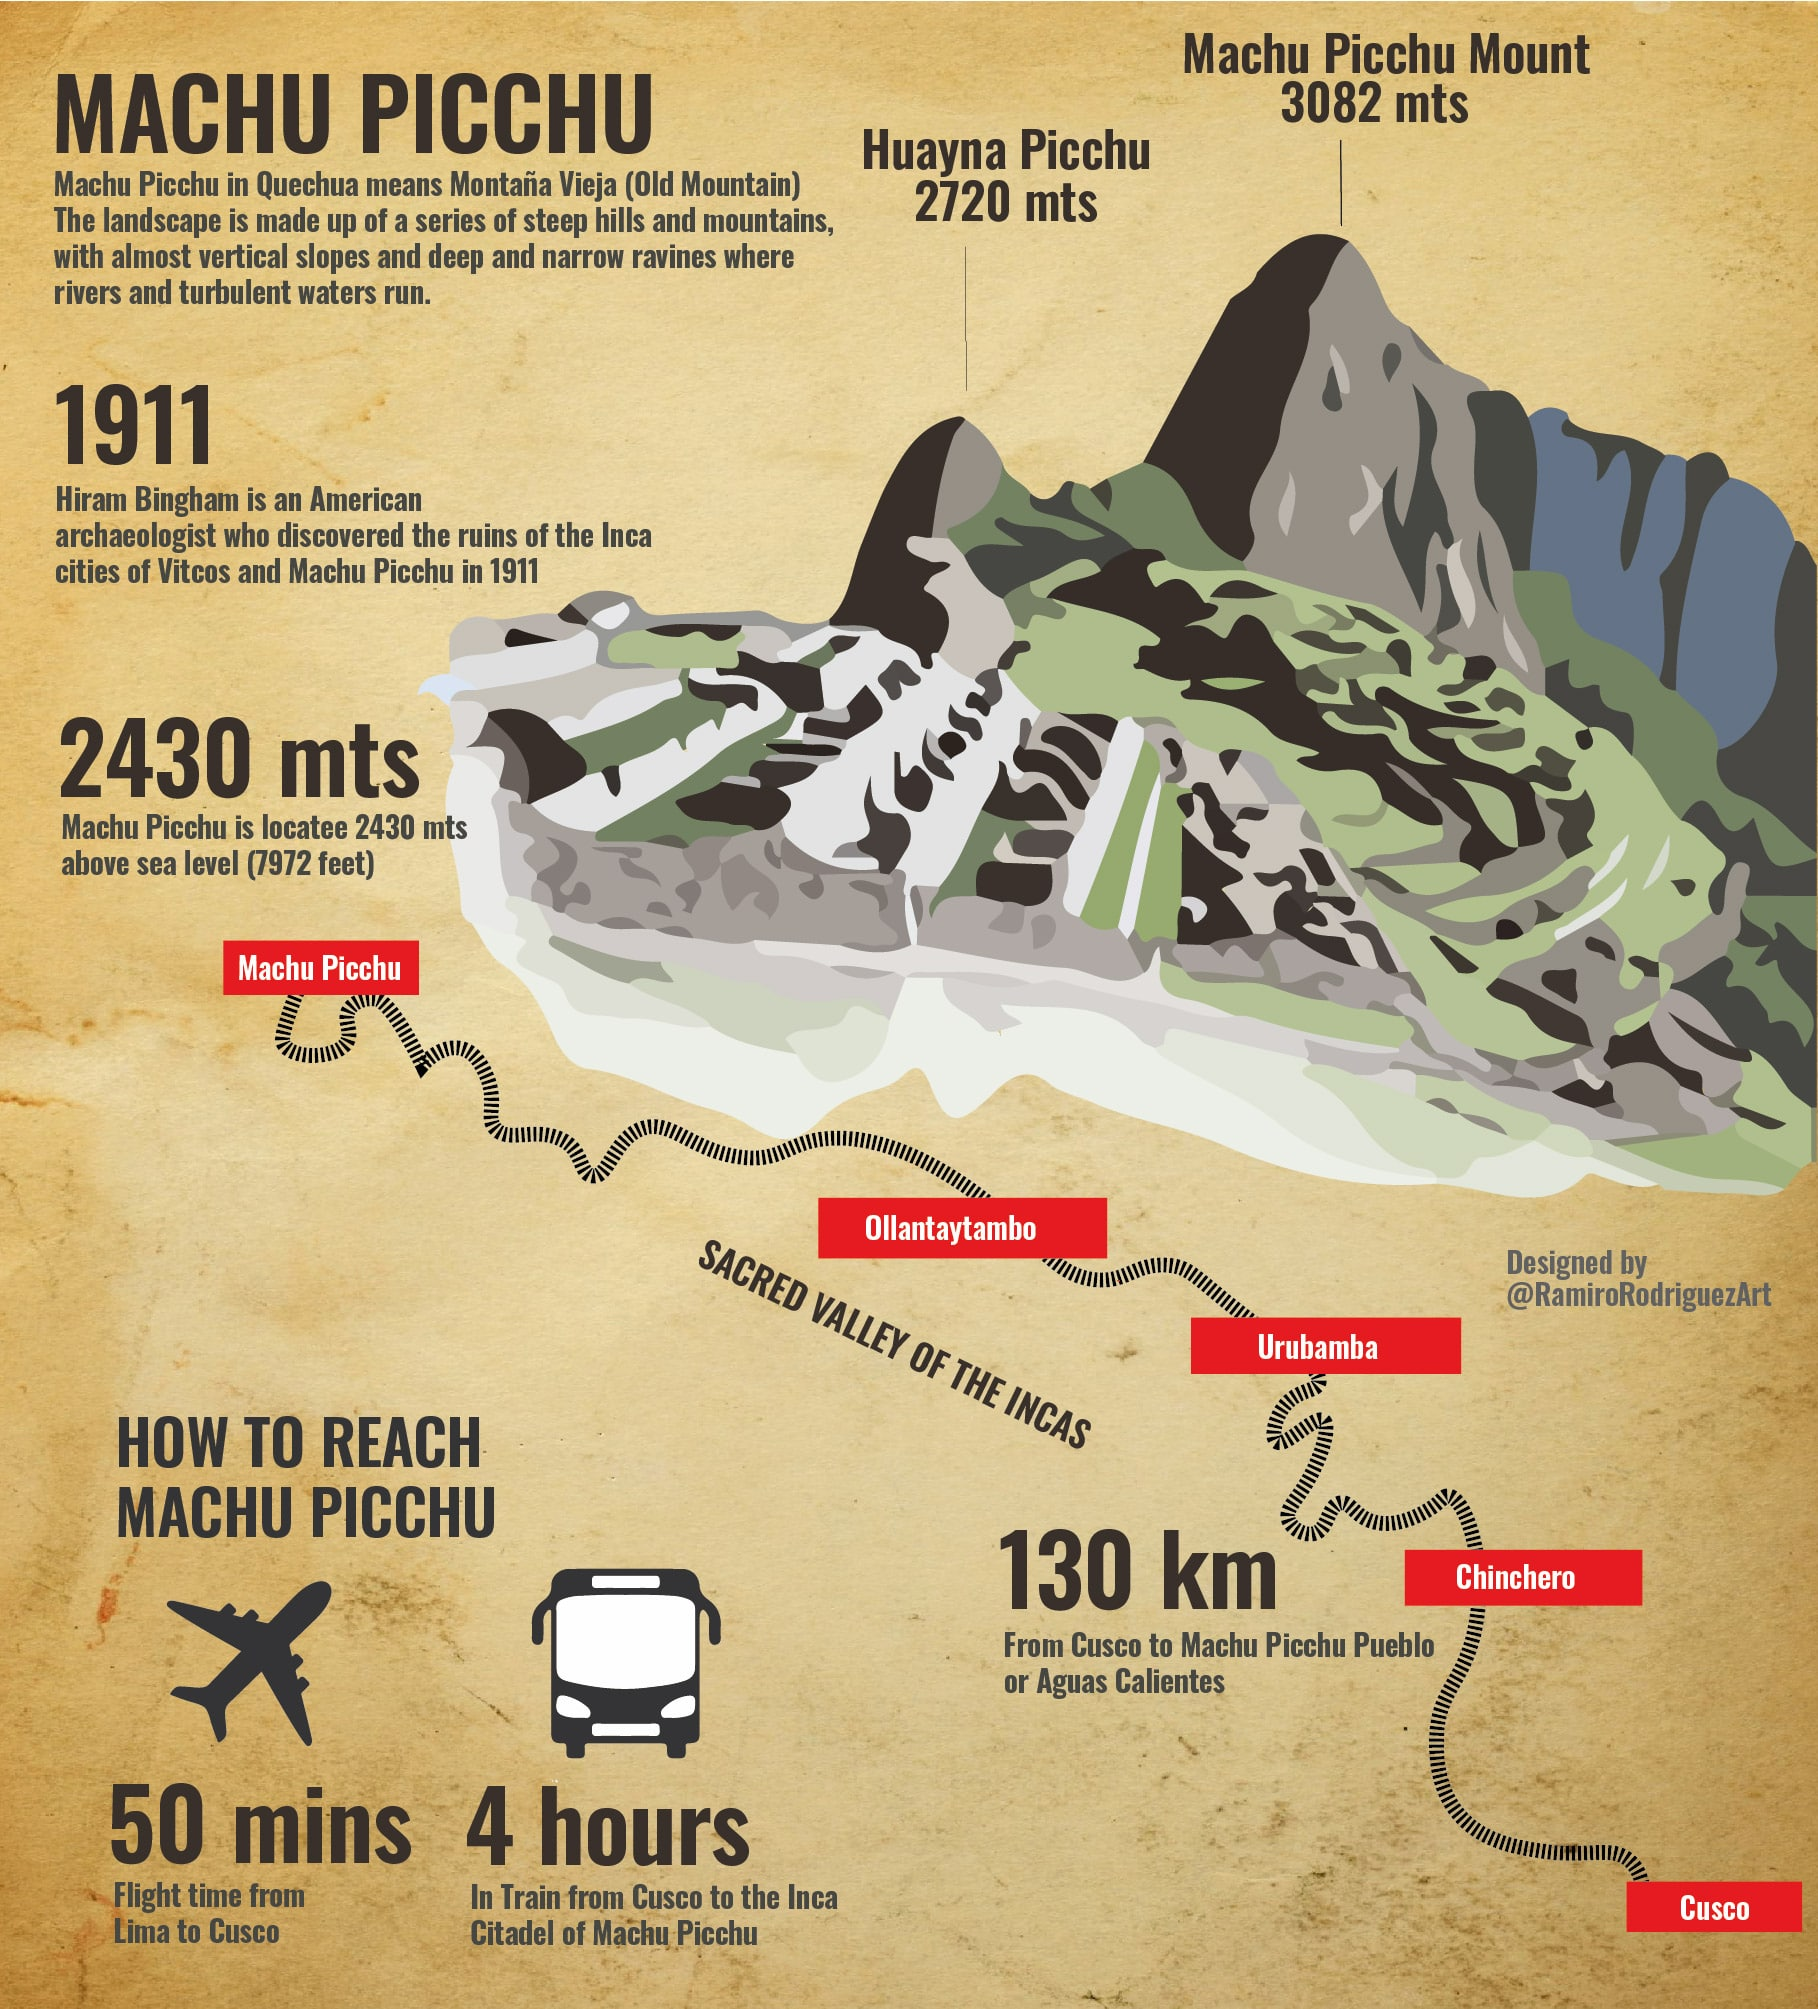 Machu Picchu by night. From Cusco to Machu Picchu